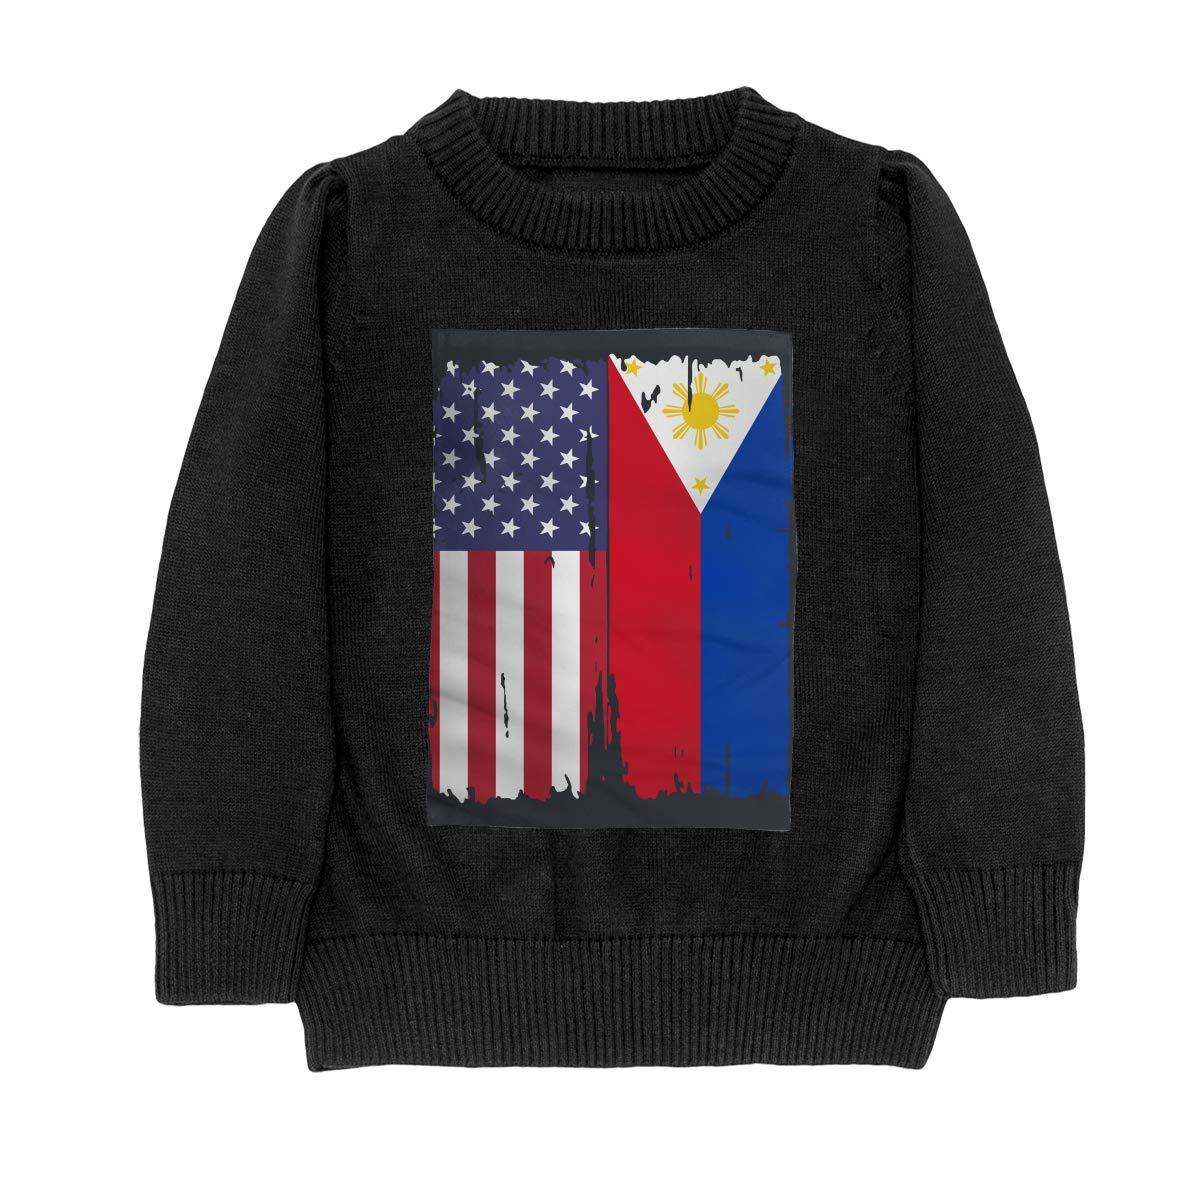 WWTBBJ-B American Philippines Flag Style Teenager Boys /& Girls Unisex Sweater Keep Warm